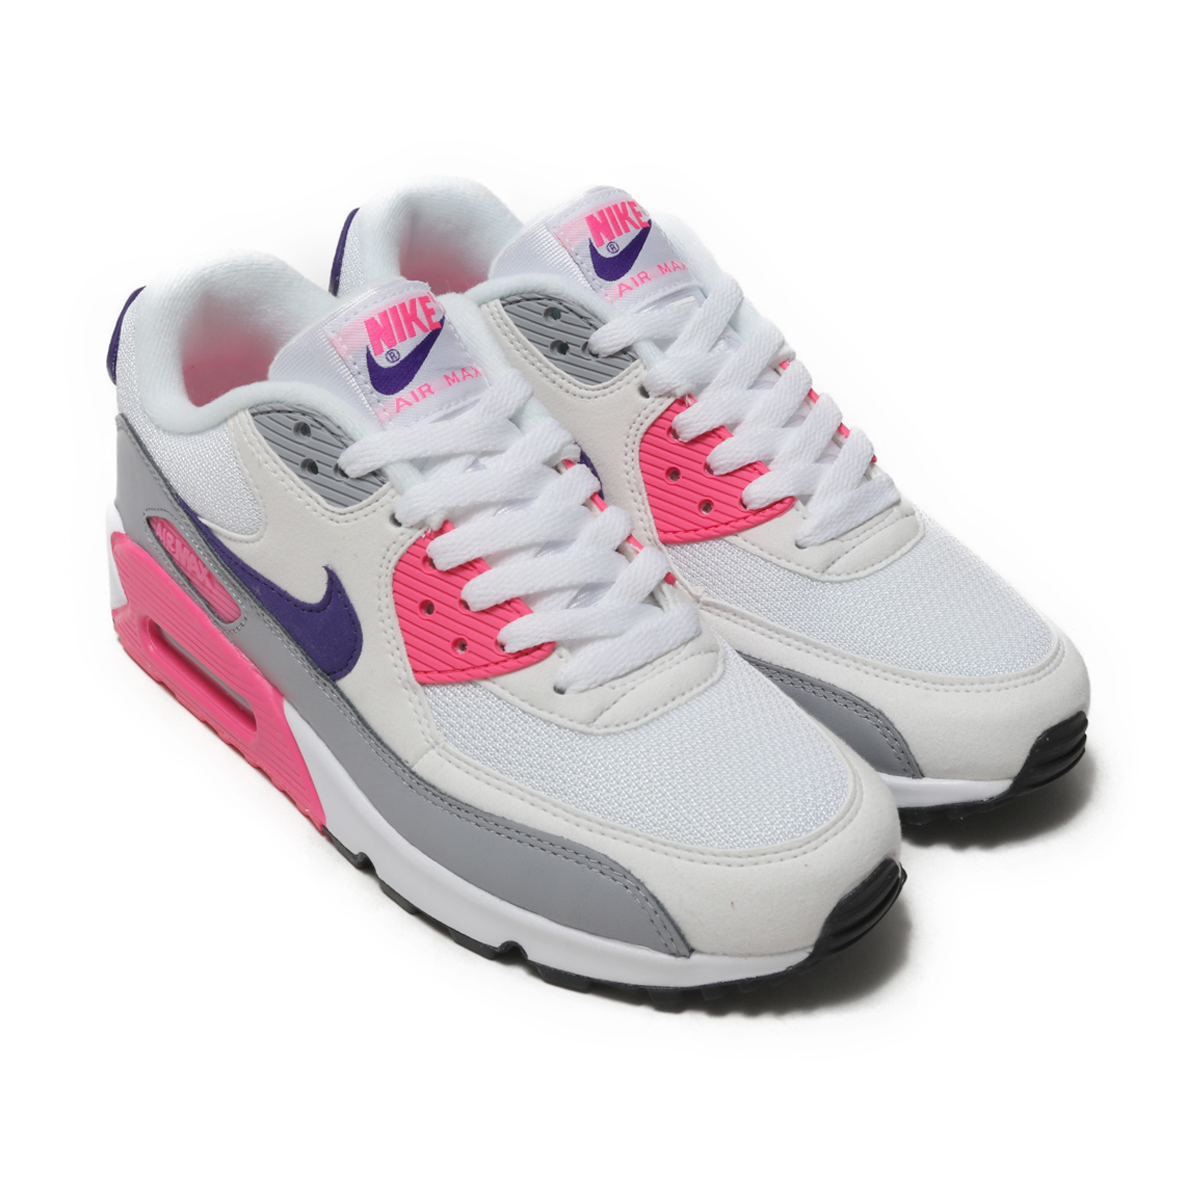 Nike Air Max 90 White Pink Gray Black Women Shoes | Nike Air